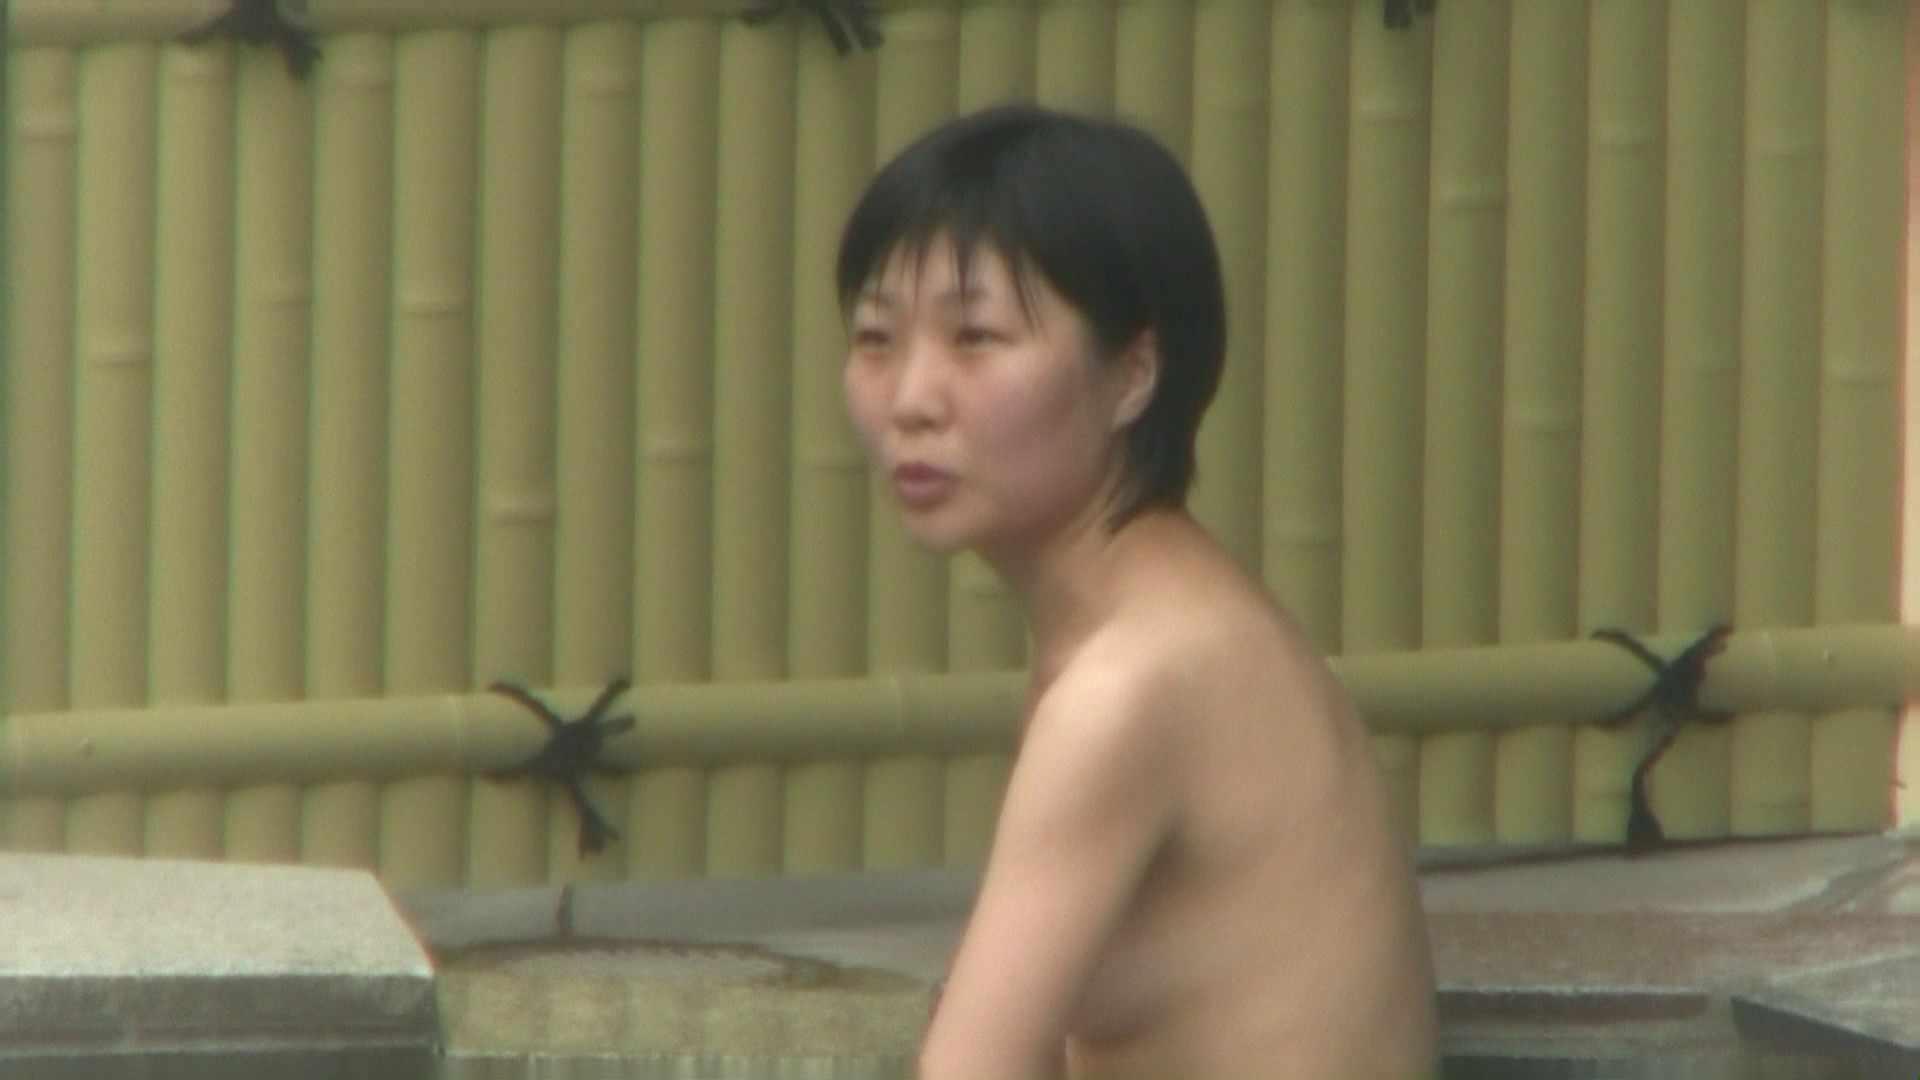 Aquaな露天風呂Vol.73【VIP限定】 盗撮 | HなOL  54pic 36